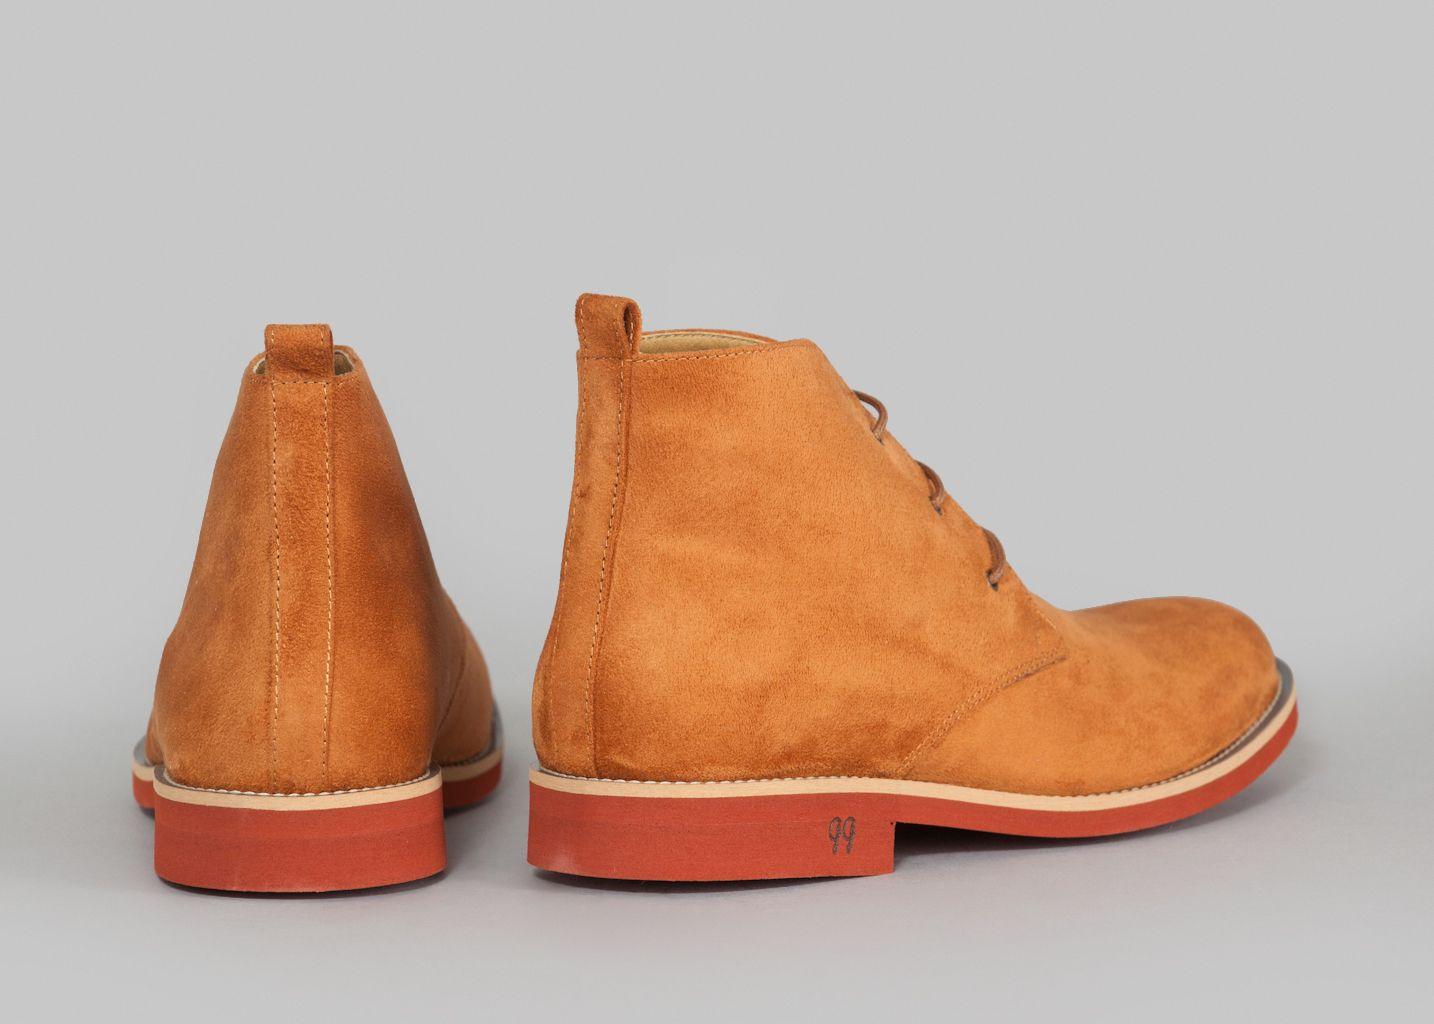 Ayita Boots - Good Guys